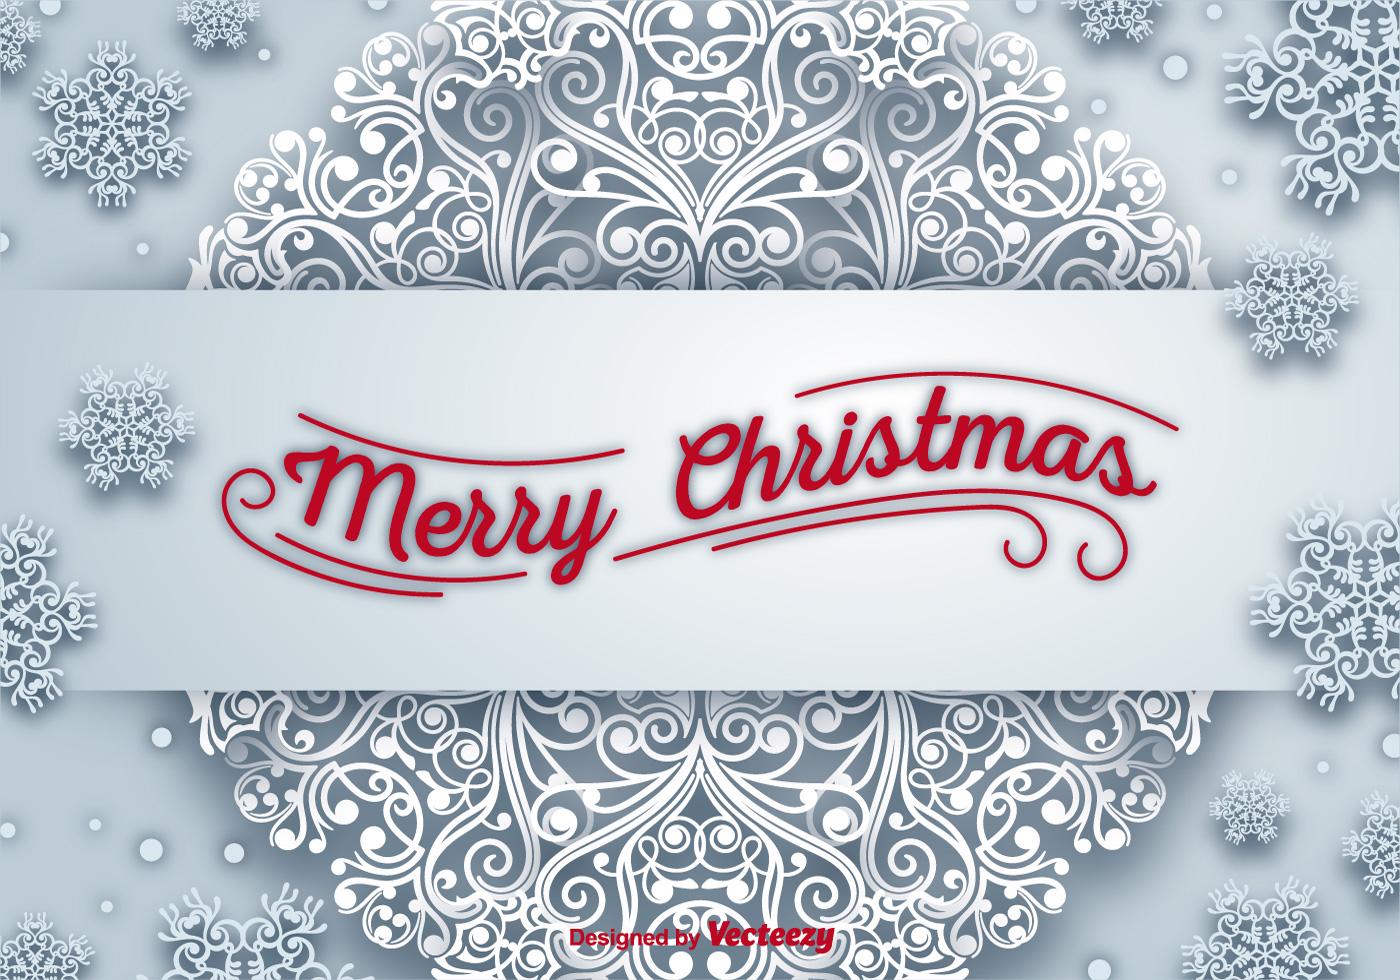 Merry christmas banner download free vector art stock